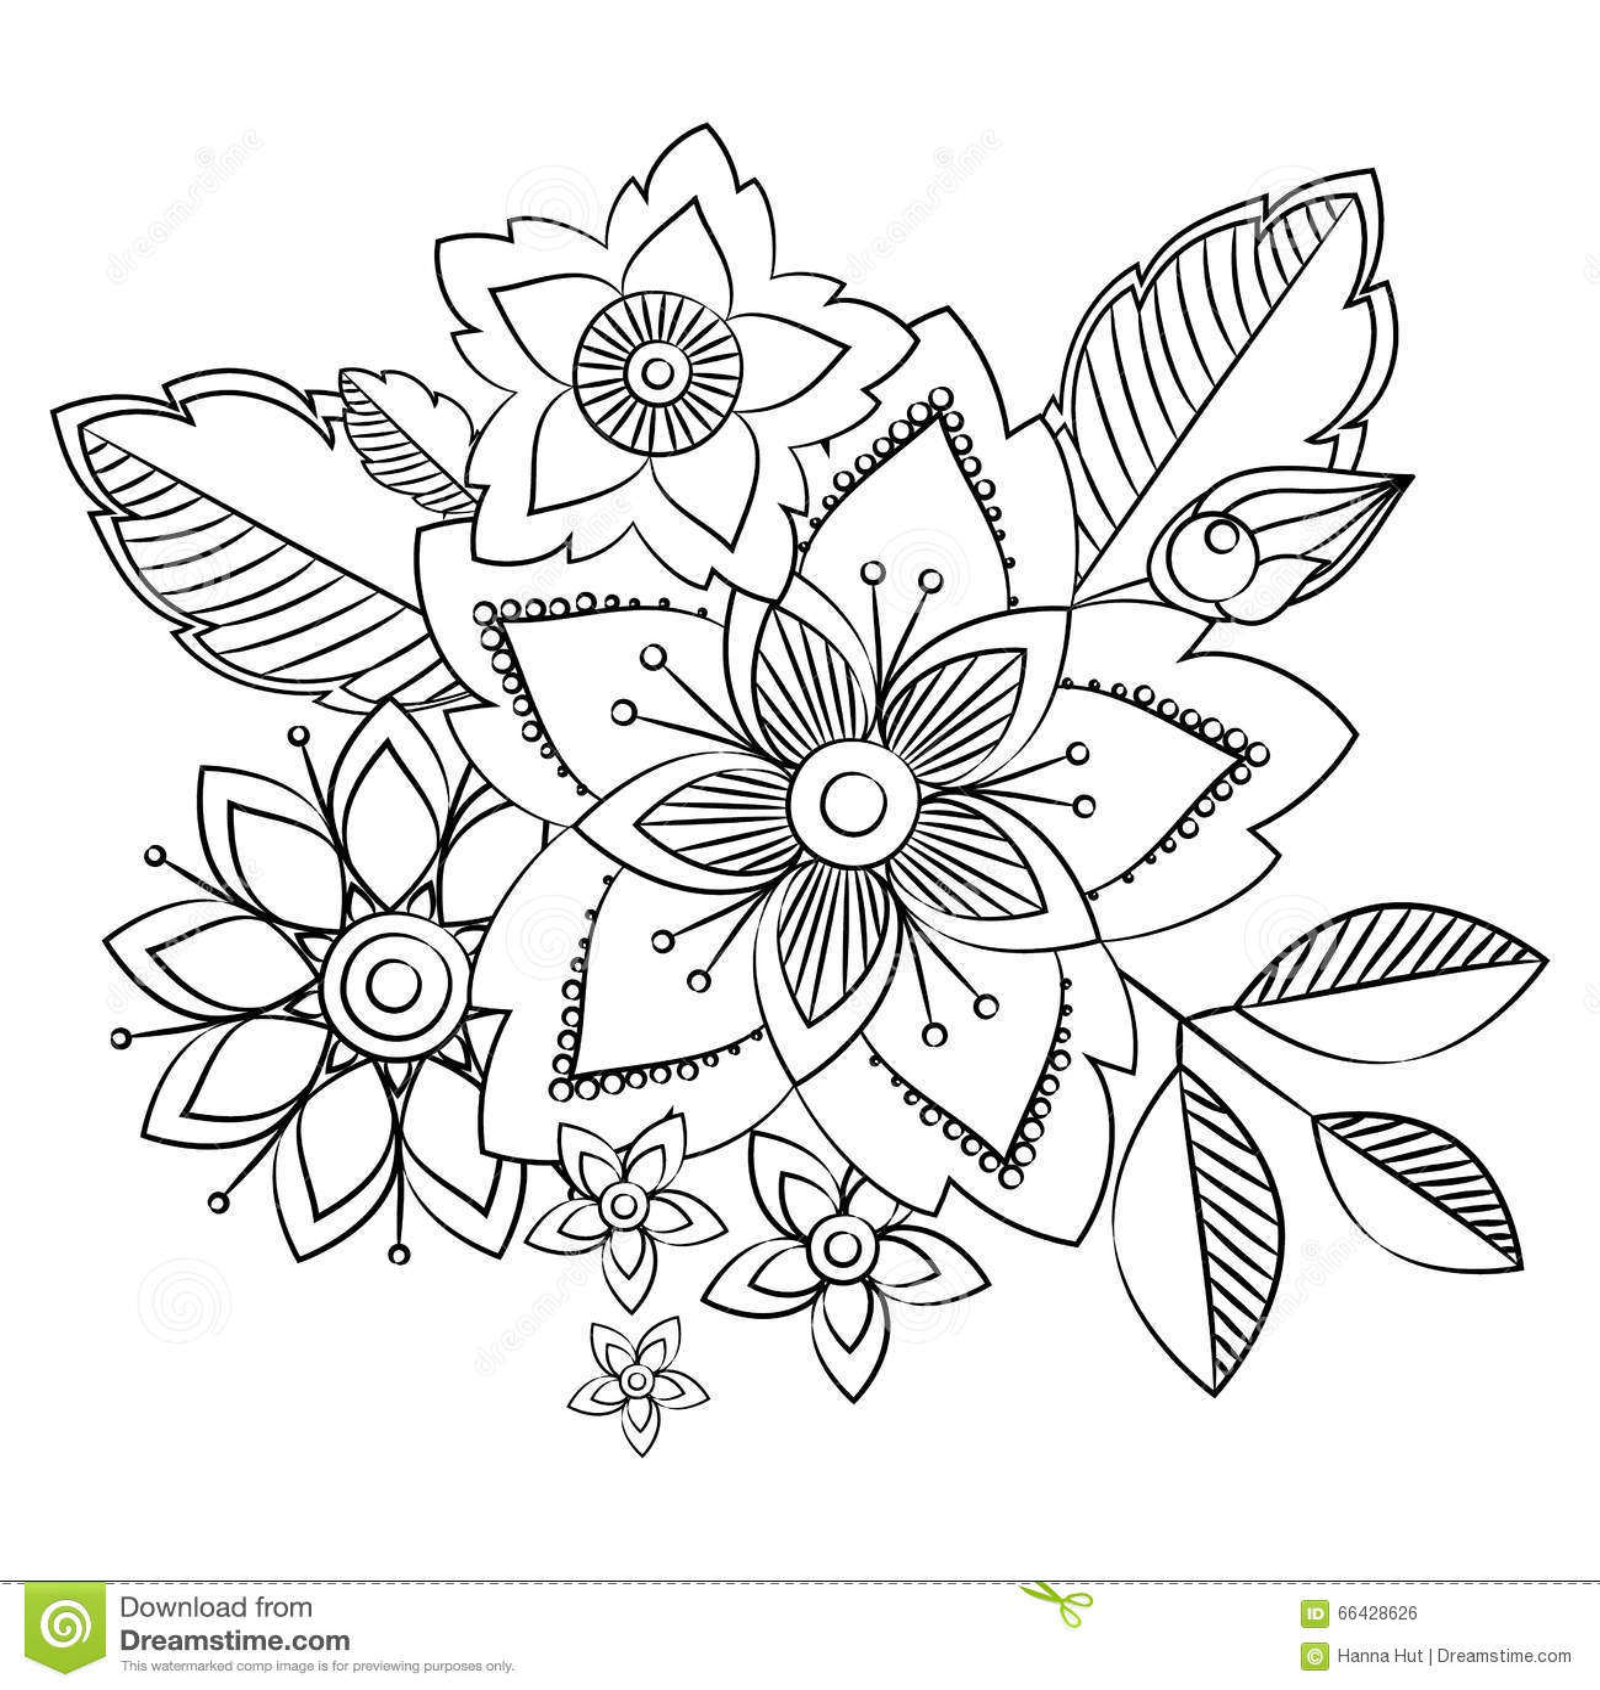 Doodle Art Flowers Hand Drawn Herbal Design Elements